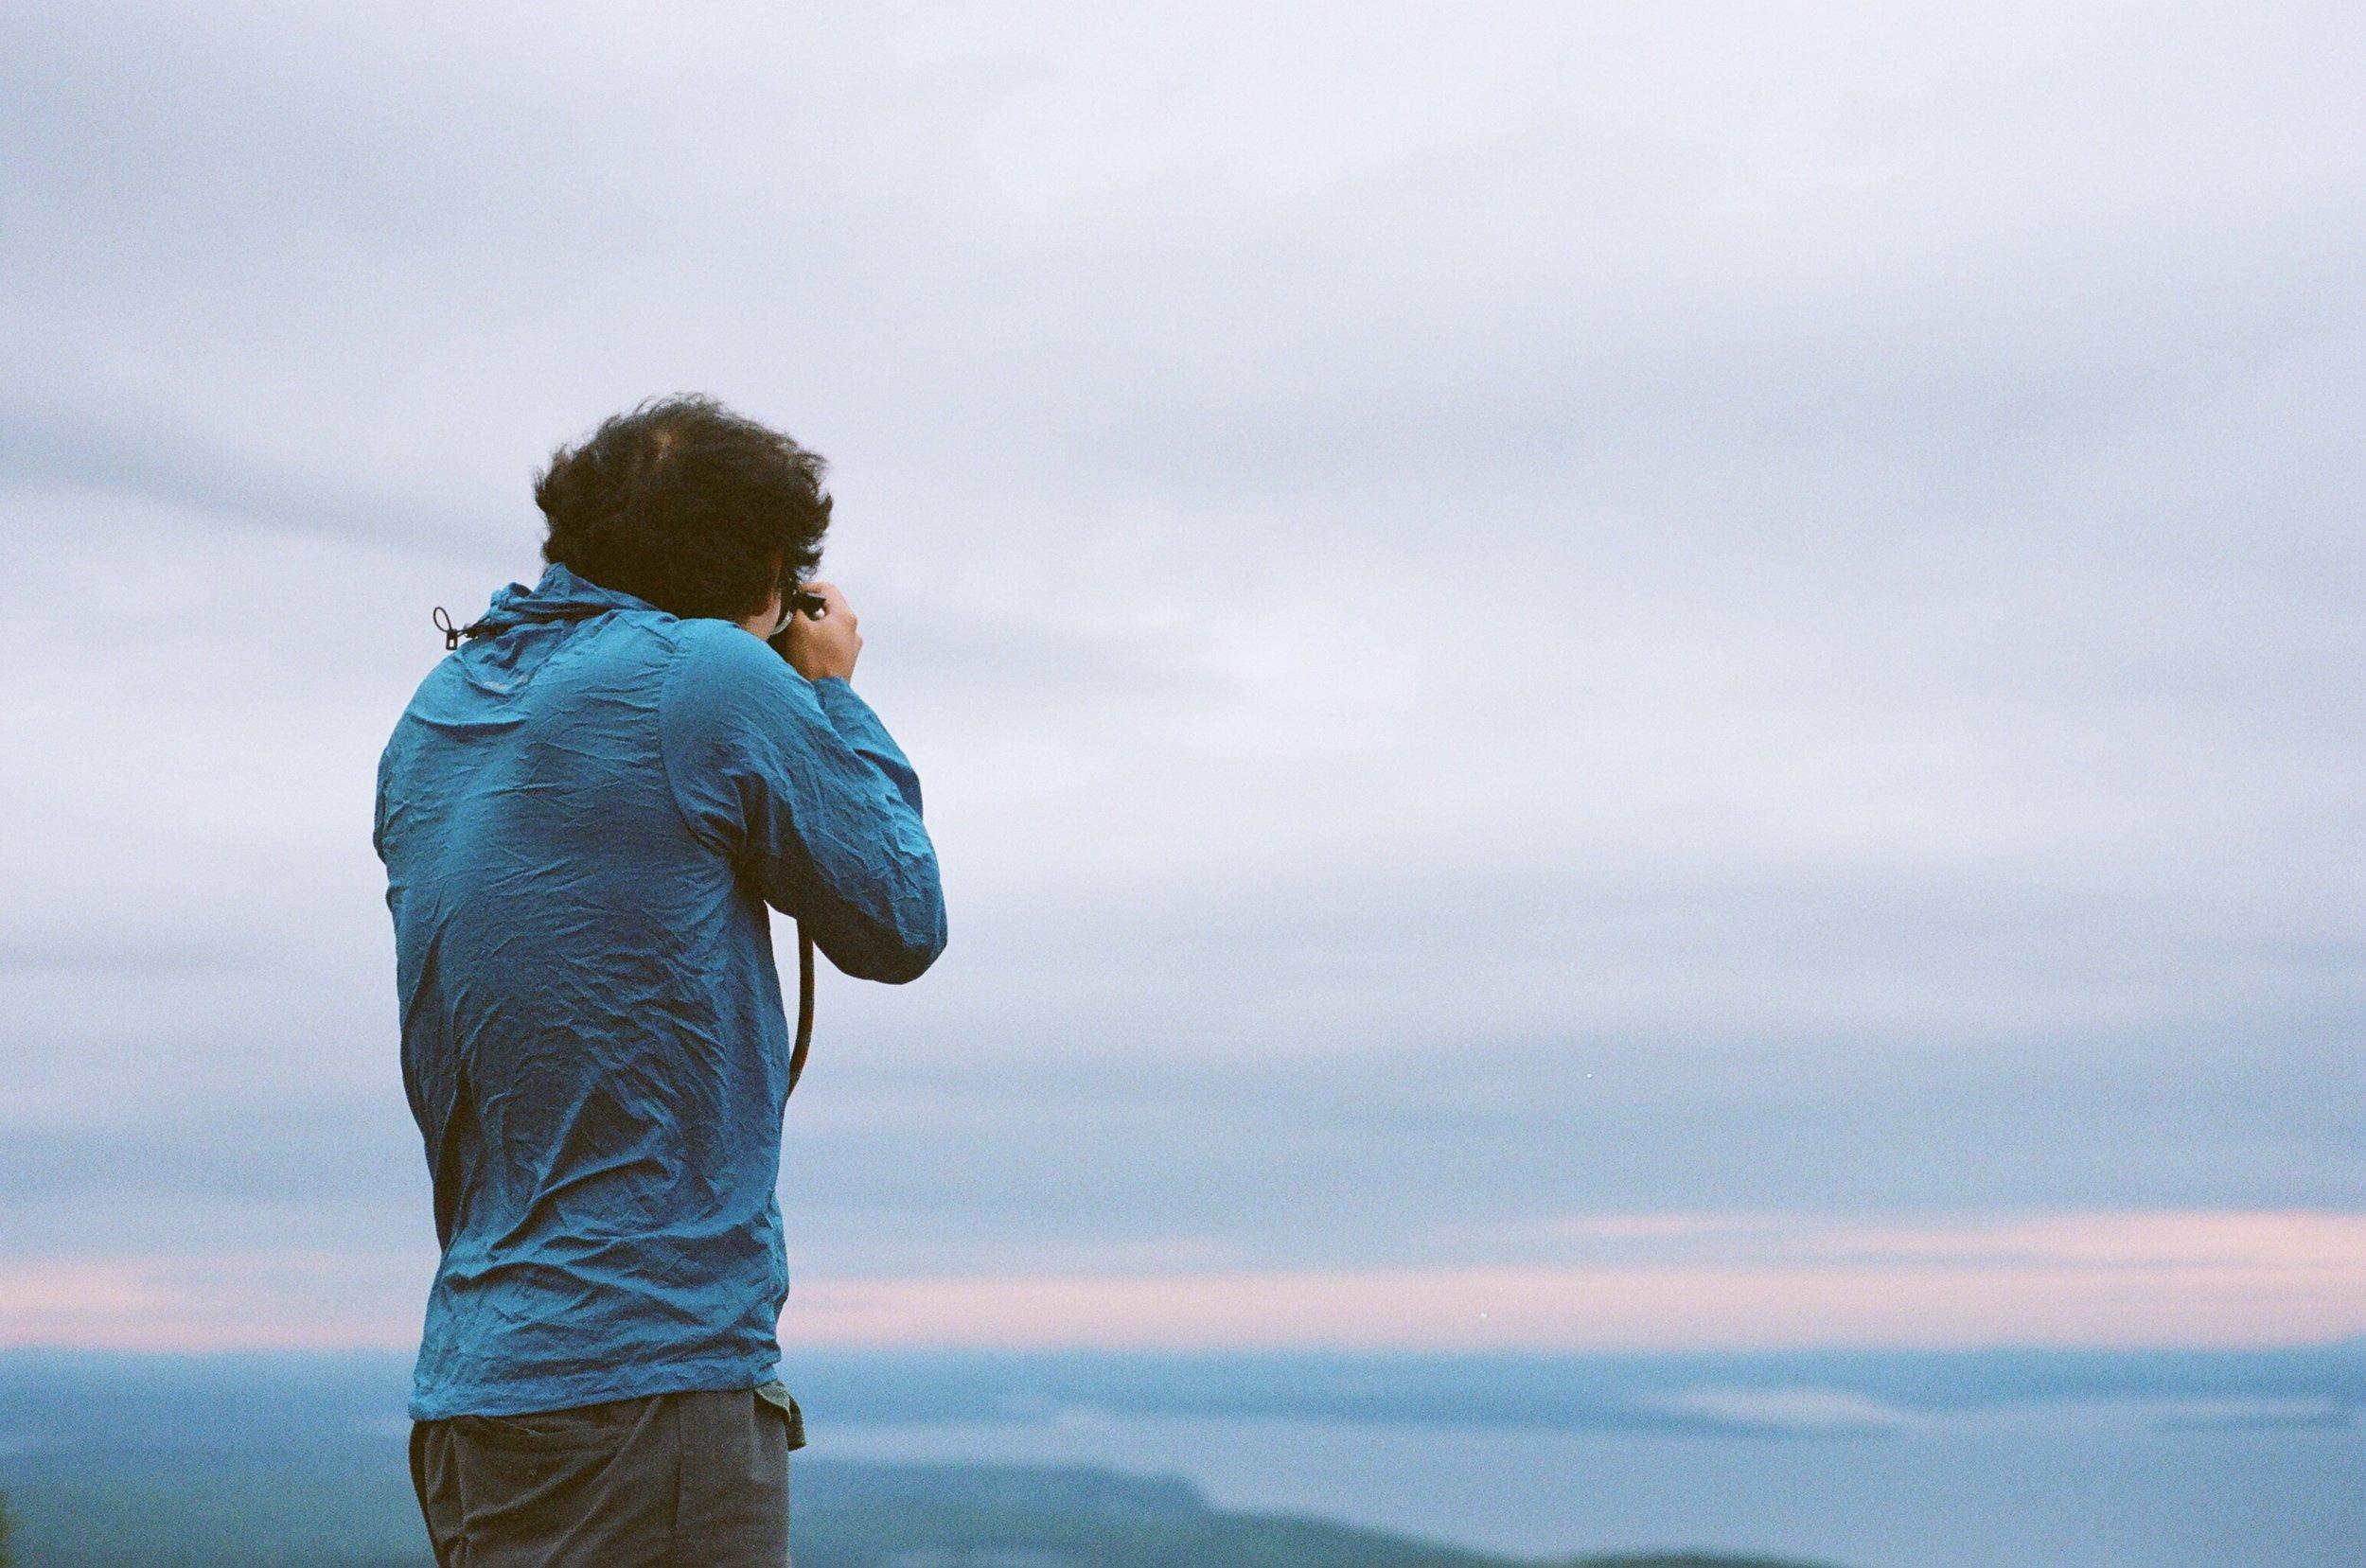 Owen on Cadillac Mountain, 35mm Film